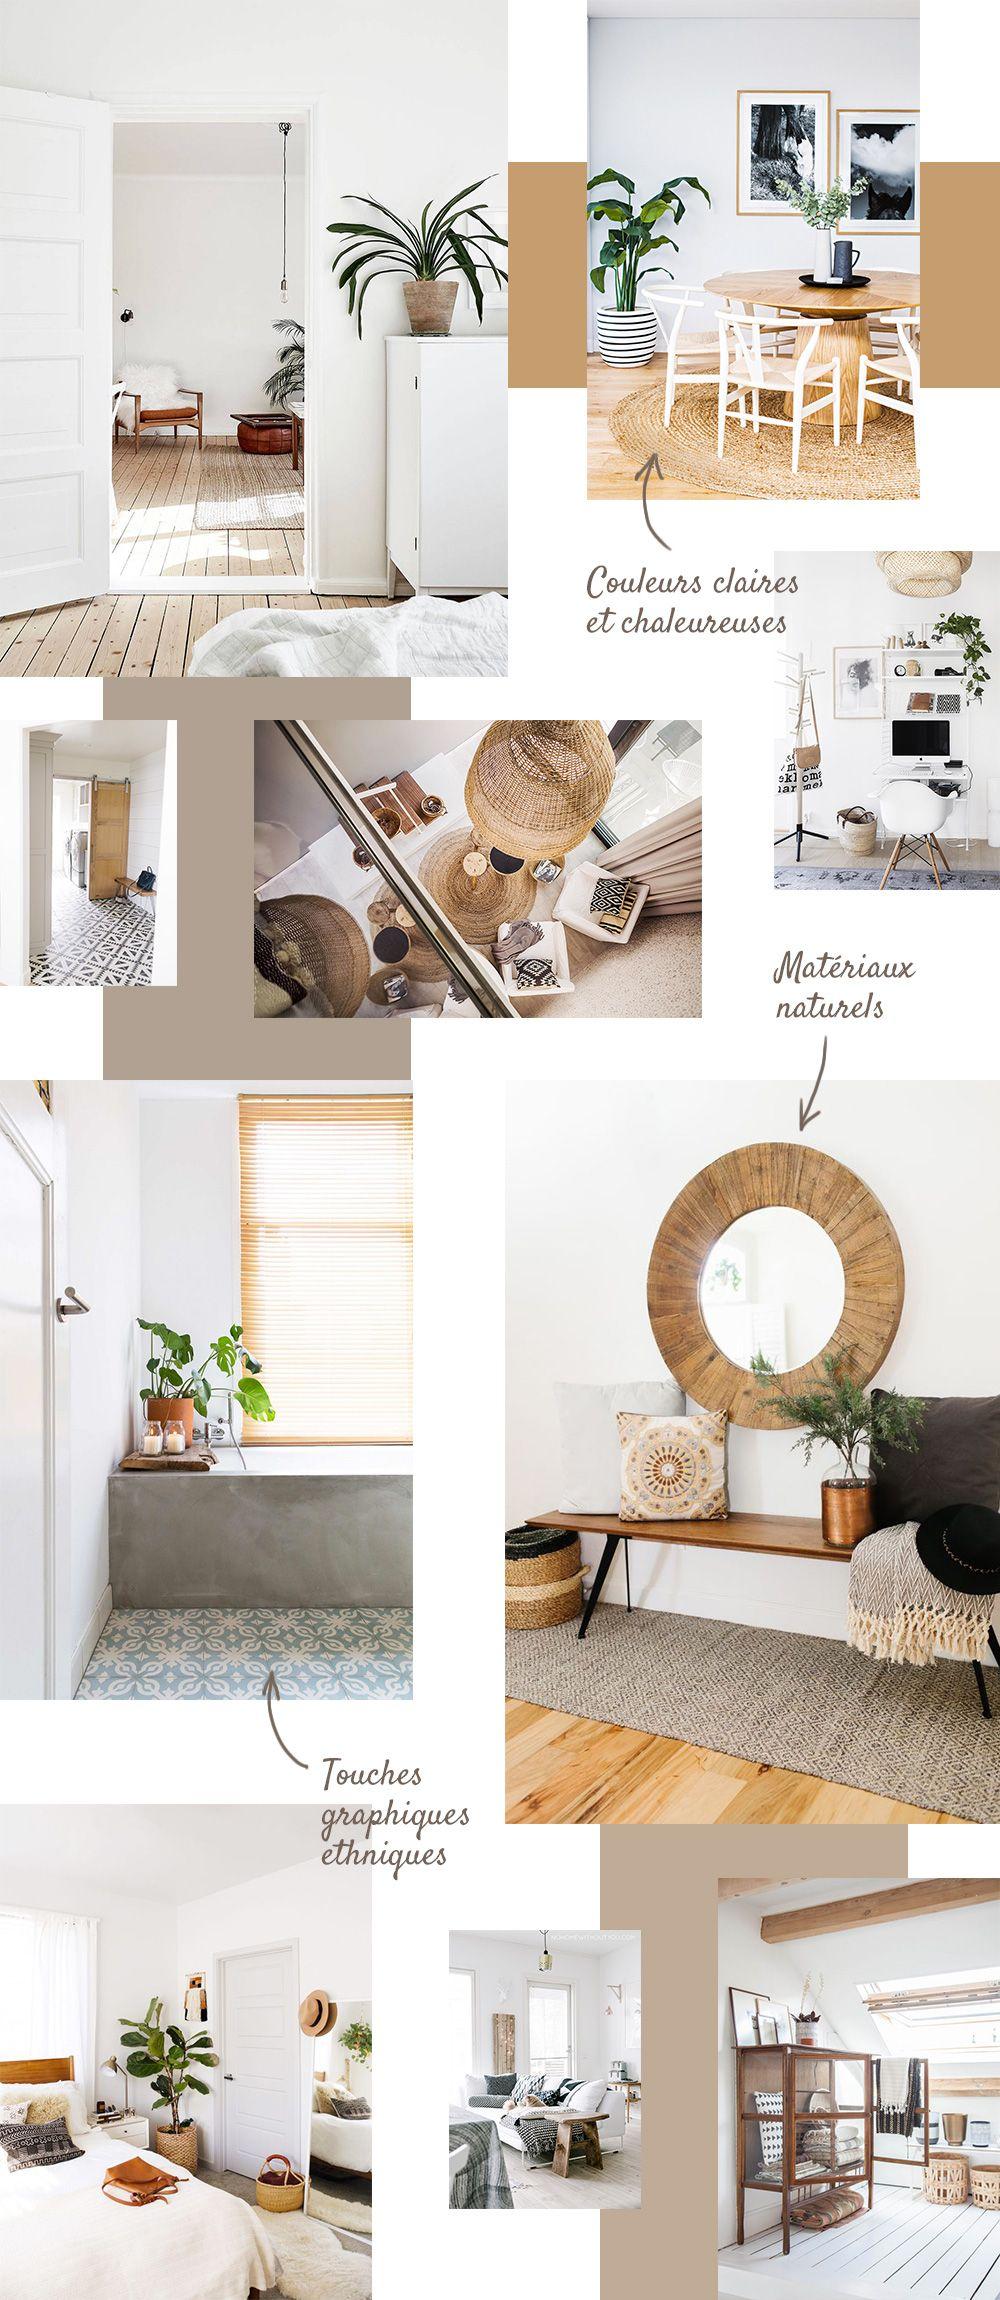 Inspiration D Co Nature Et Boh Me Salons Inspiration And Interiors